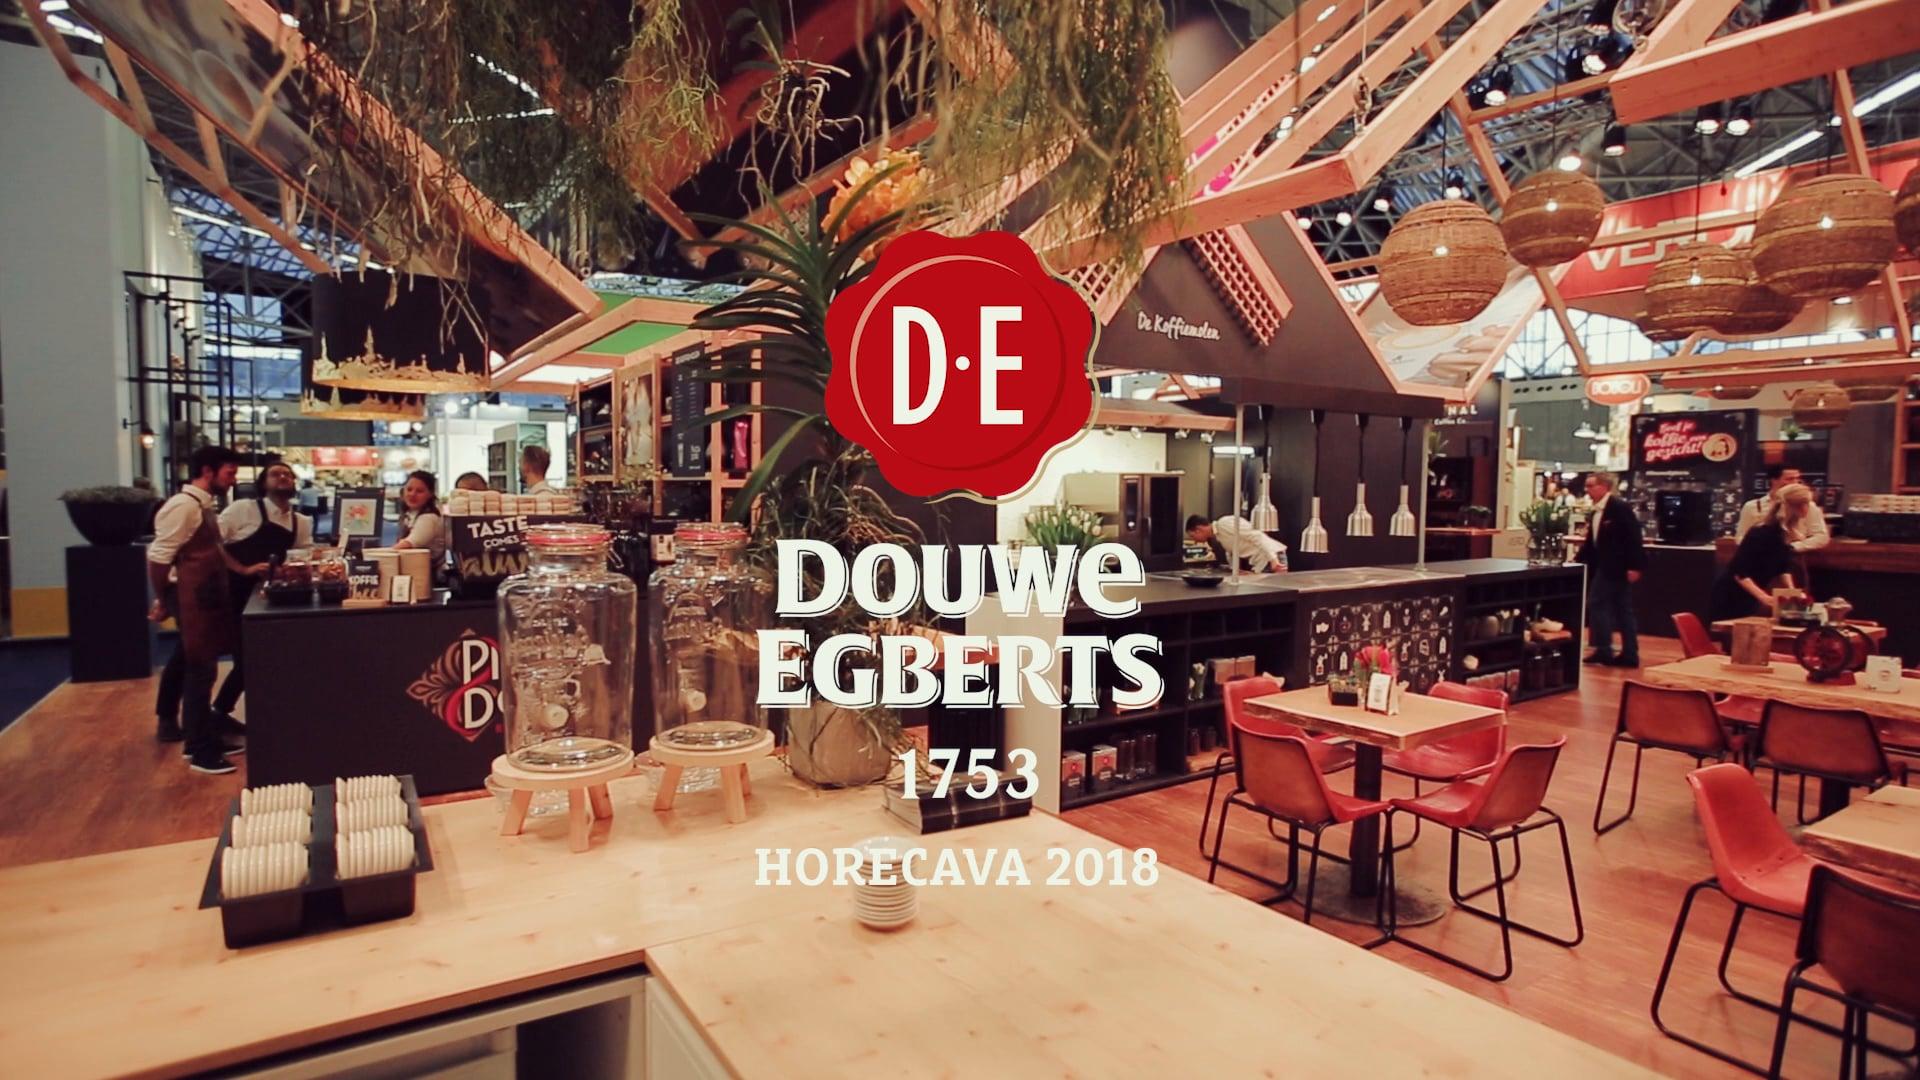 Douwe Egberts Horecava Event Video